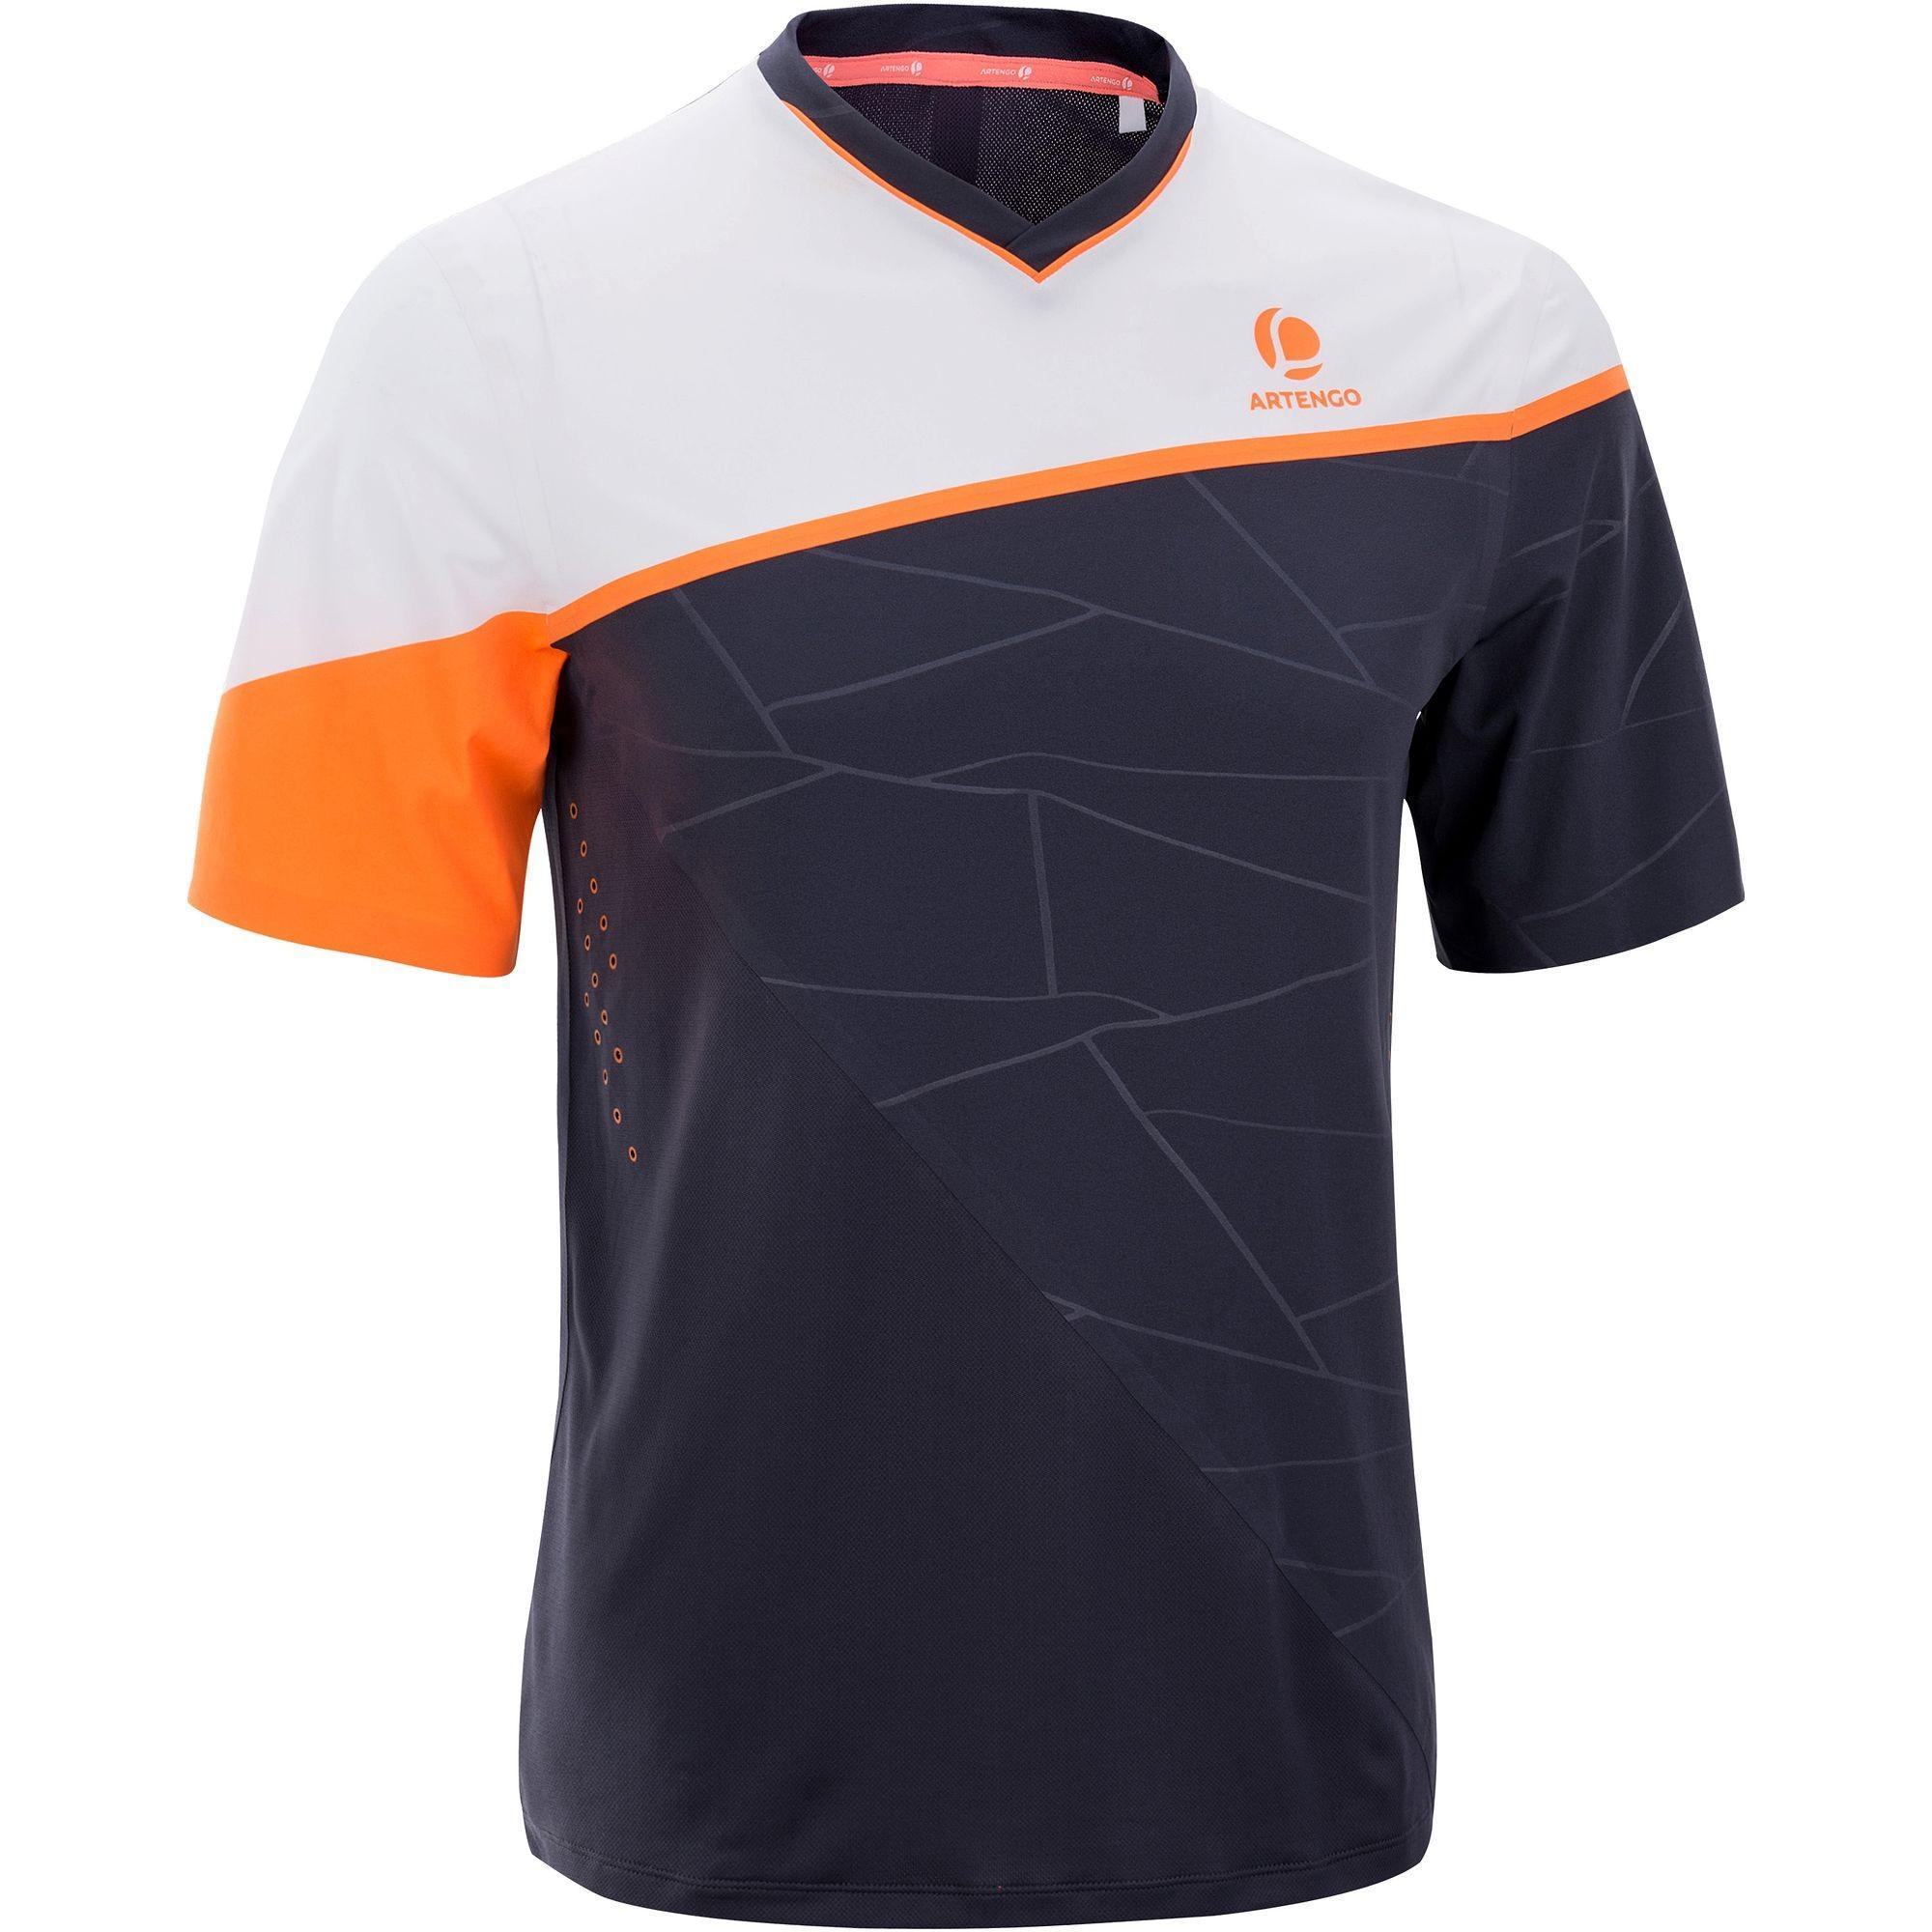 T-shirt Artengo 990 H - Gris (Taille XL)